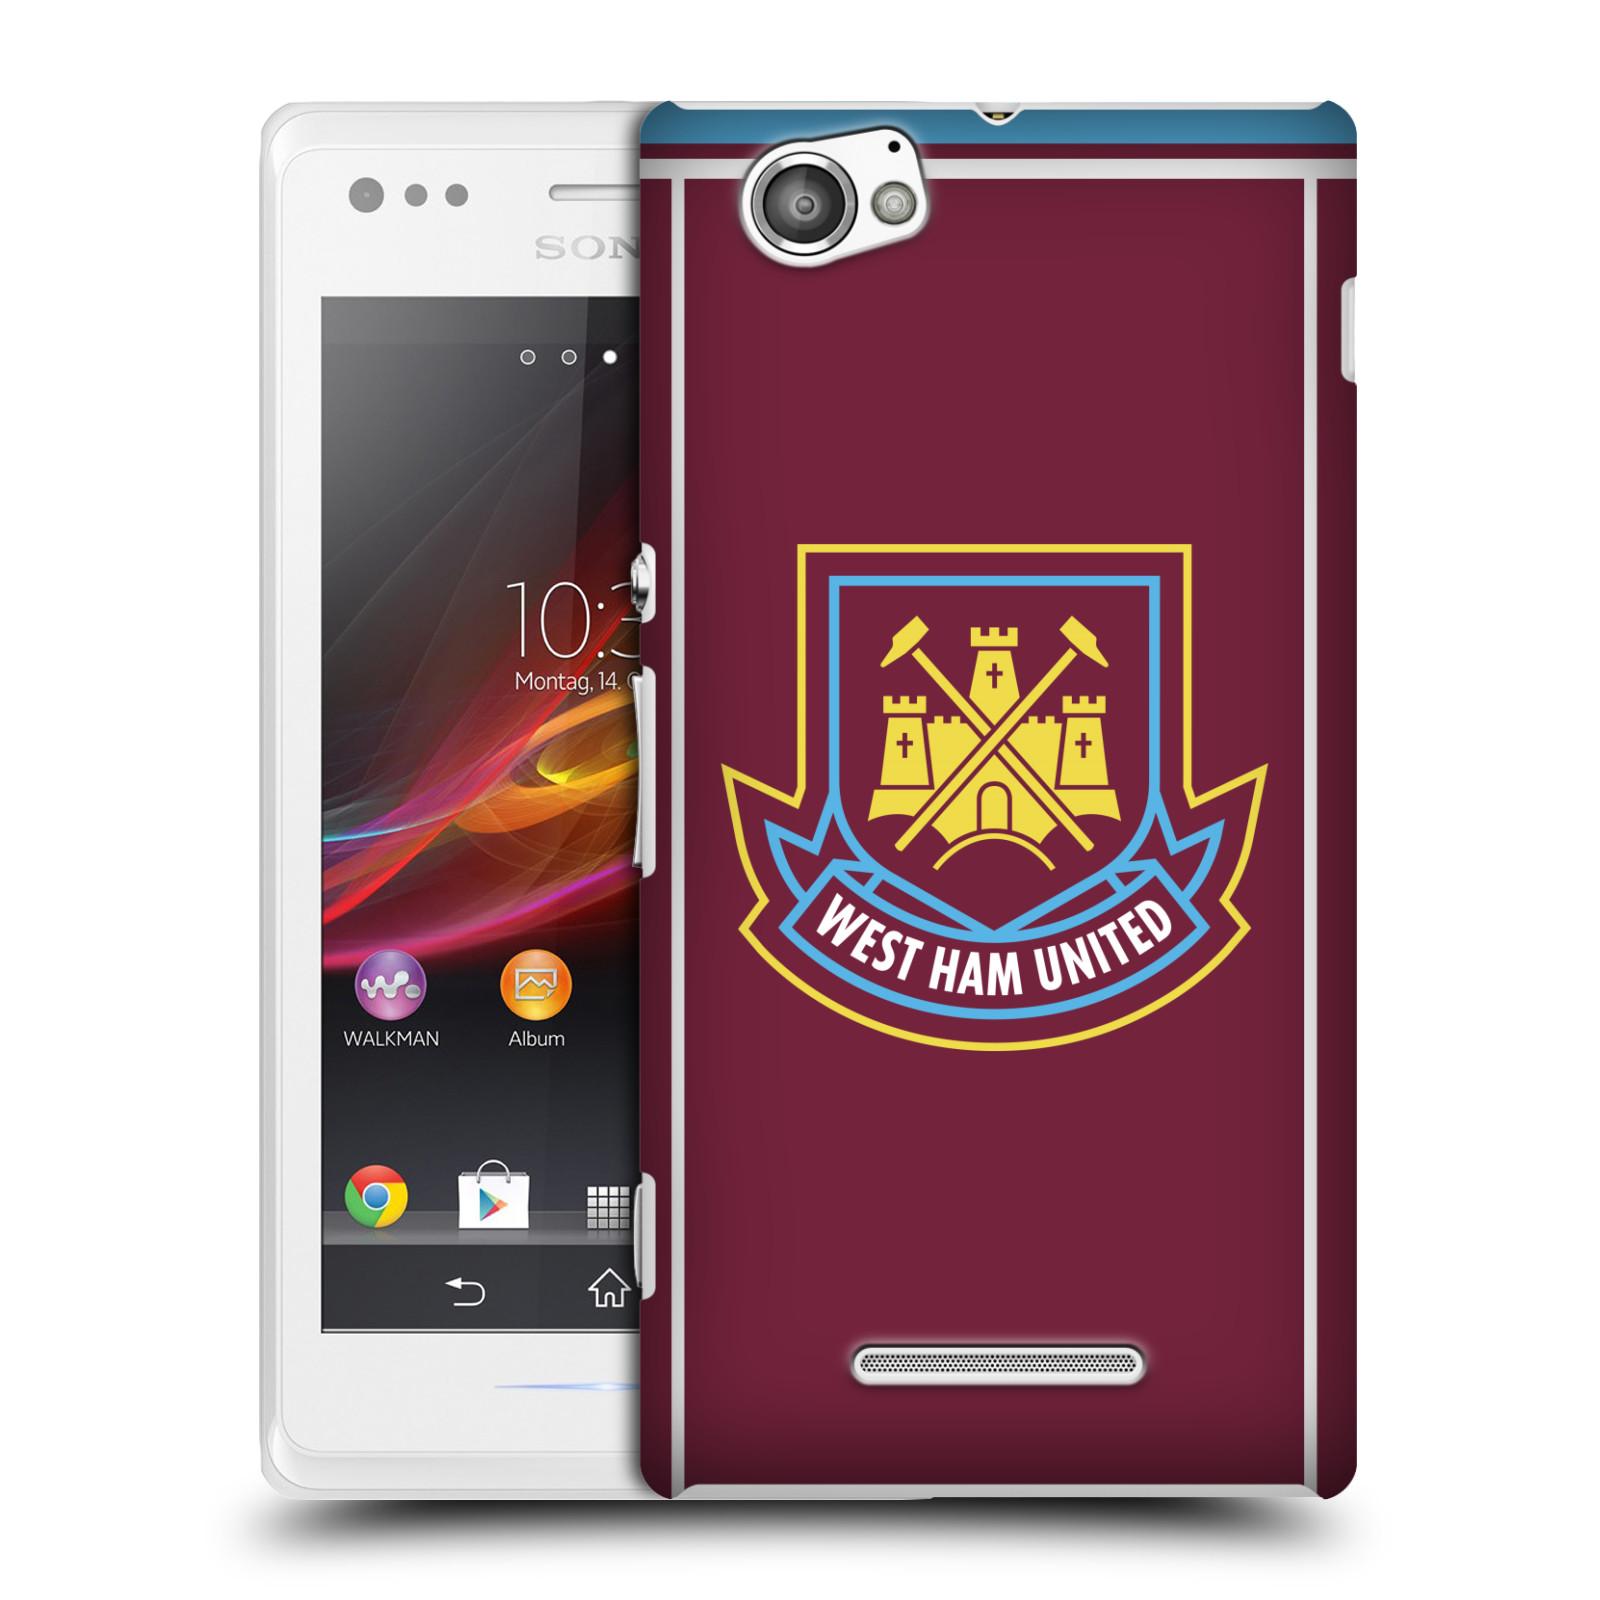 Plastové pouzdro na mobil Sony Xperia M C1905 - Head Case - West Ham United - Retro znak